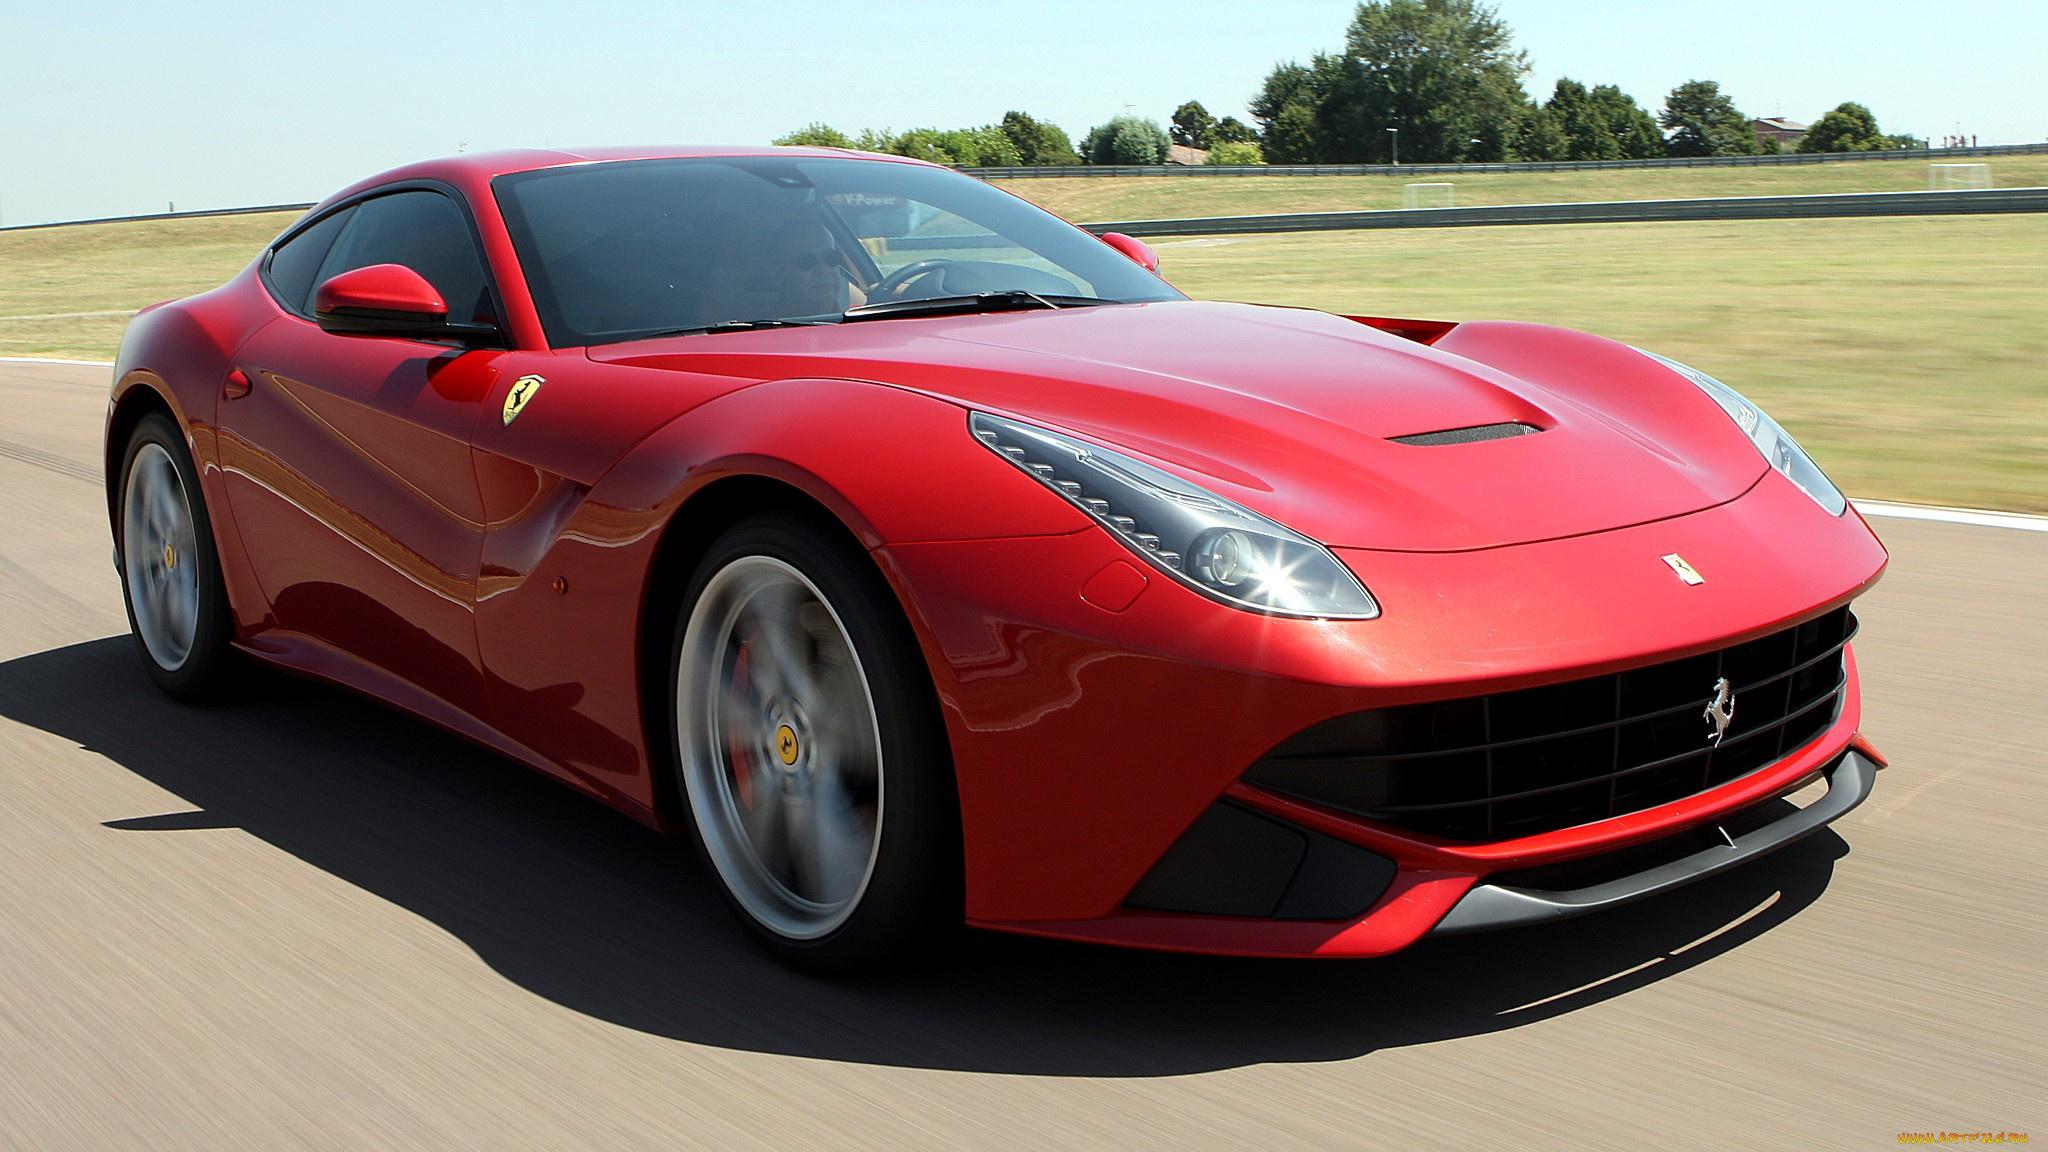 Ferrari F12 Berlinetta спорткар  № 553461 загрузить